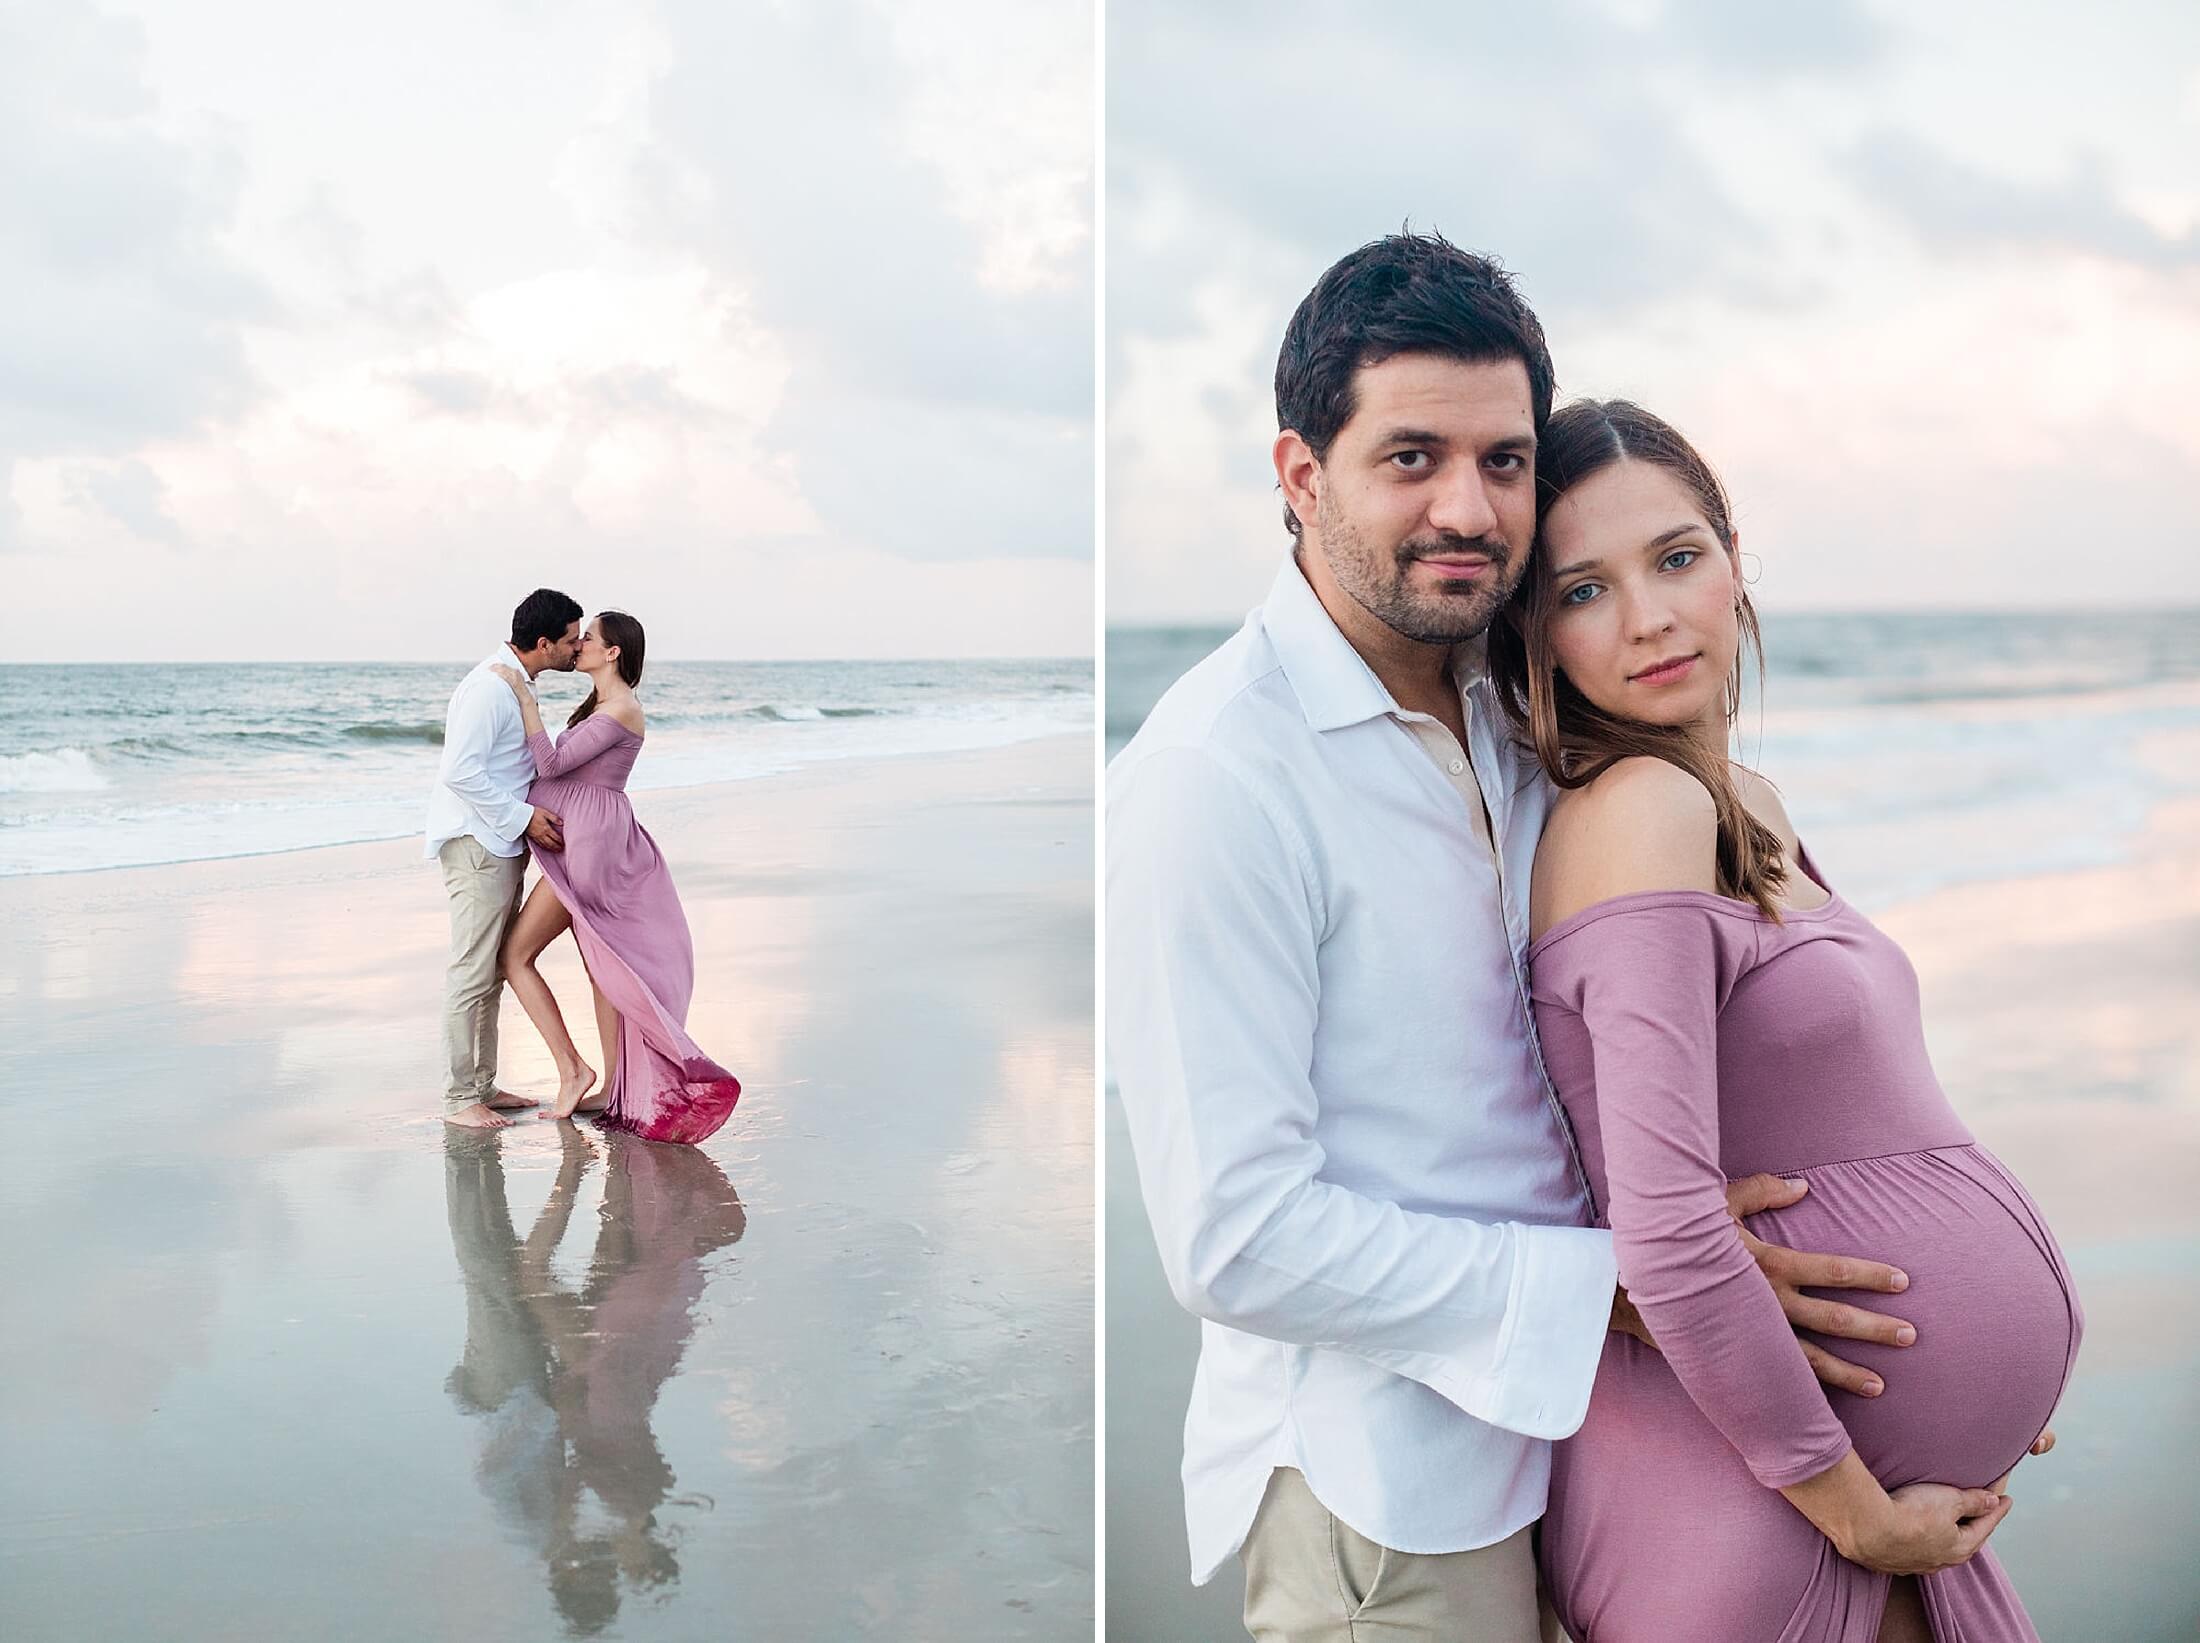 Apt-b-photography-savannah-maternity-photographer-savannah-wedding-photographer-tybee-island-engagement-tybee-maternity-2.jpg